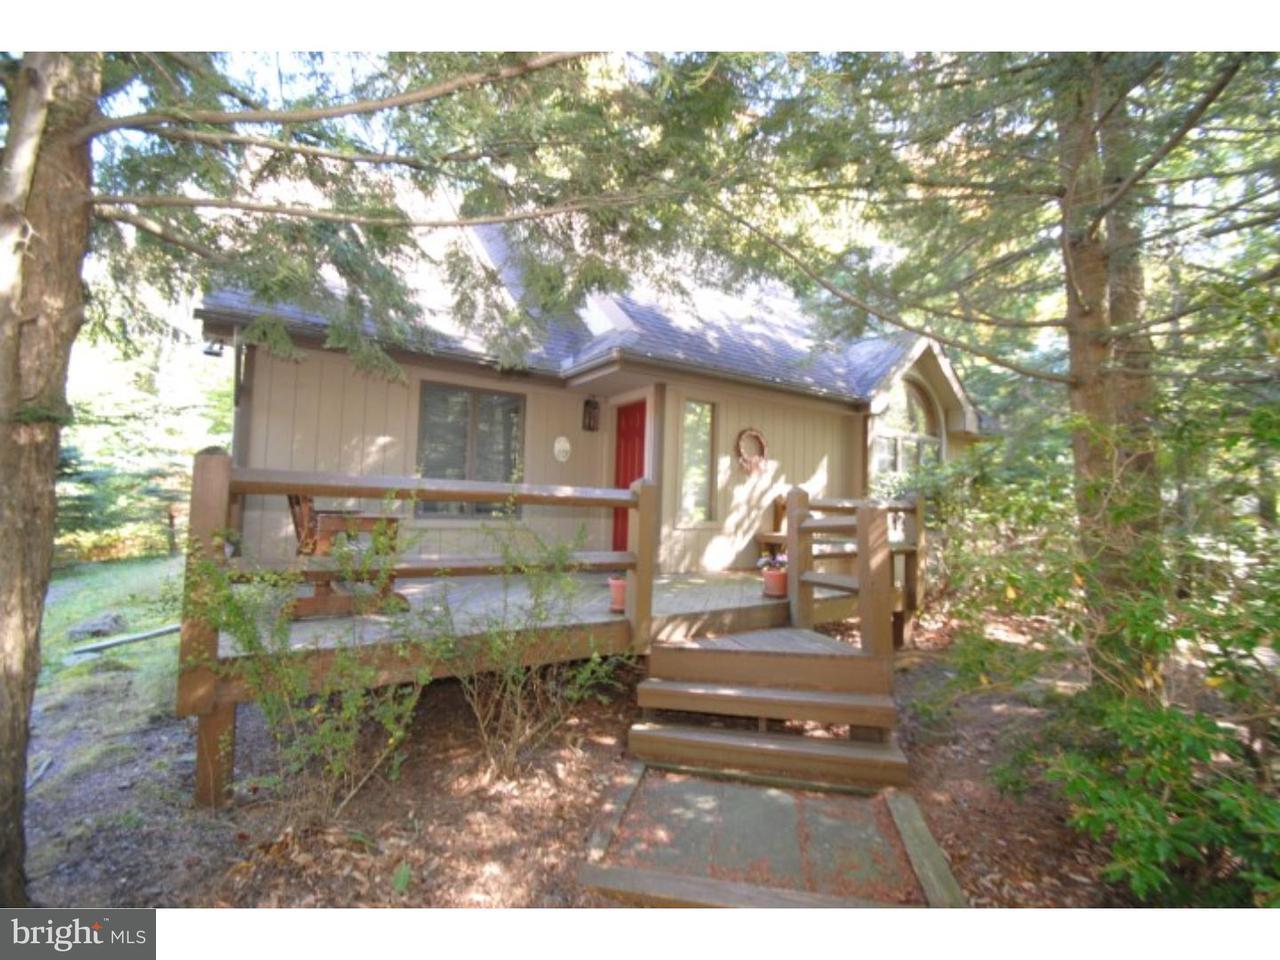 独户住宅 为 销售 在 1178 MANOR HILL Road Pocono Pines, 宾夕法尼亚州 18350 美国